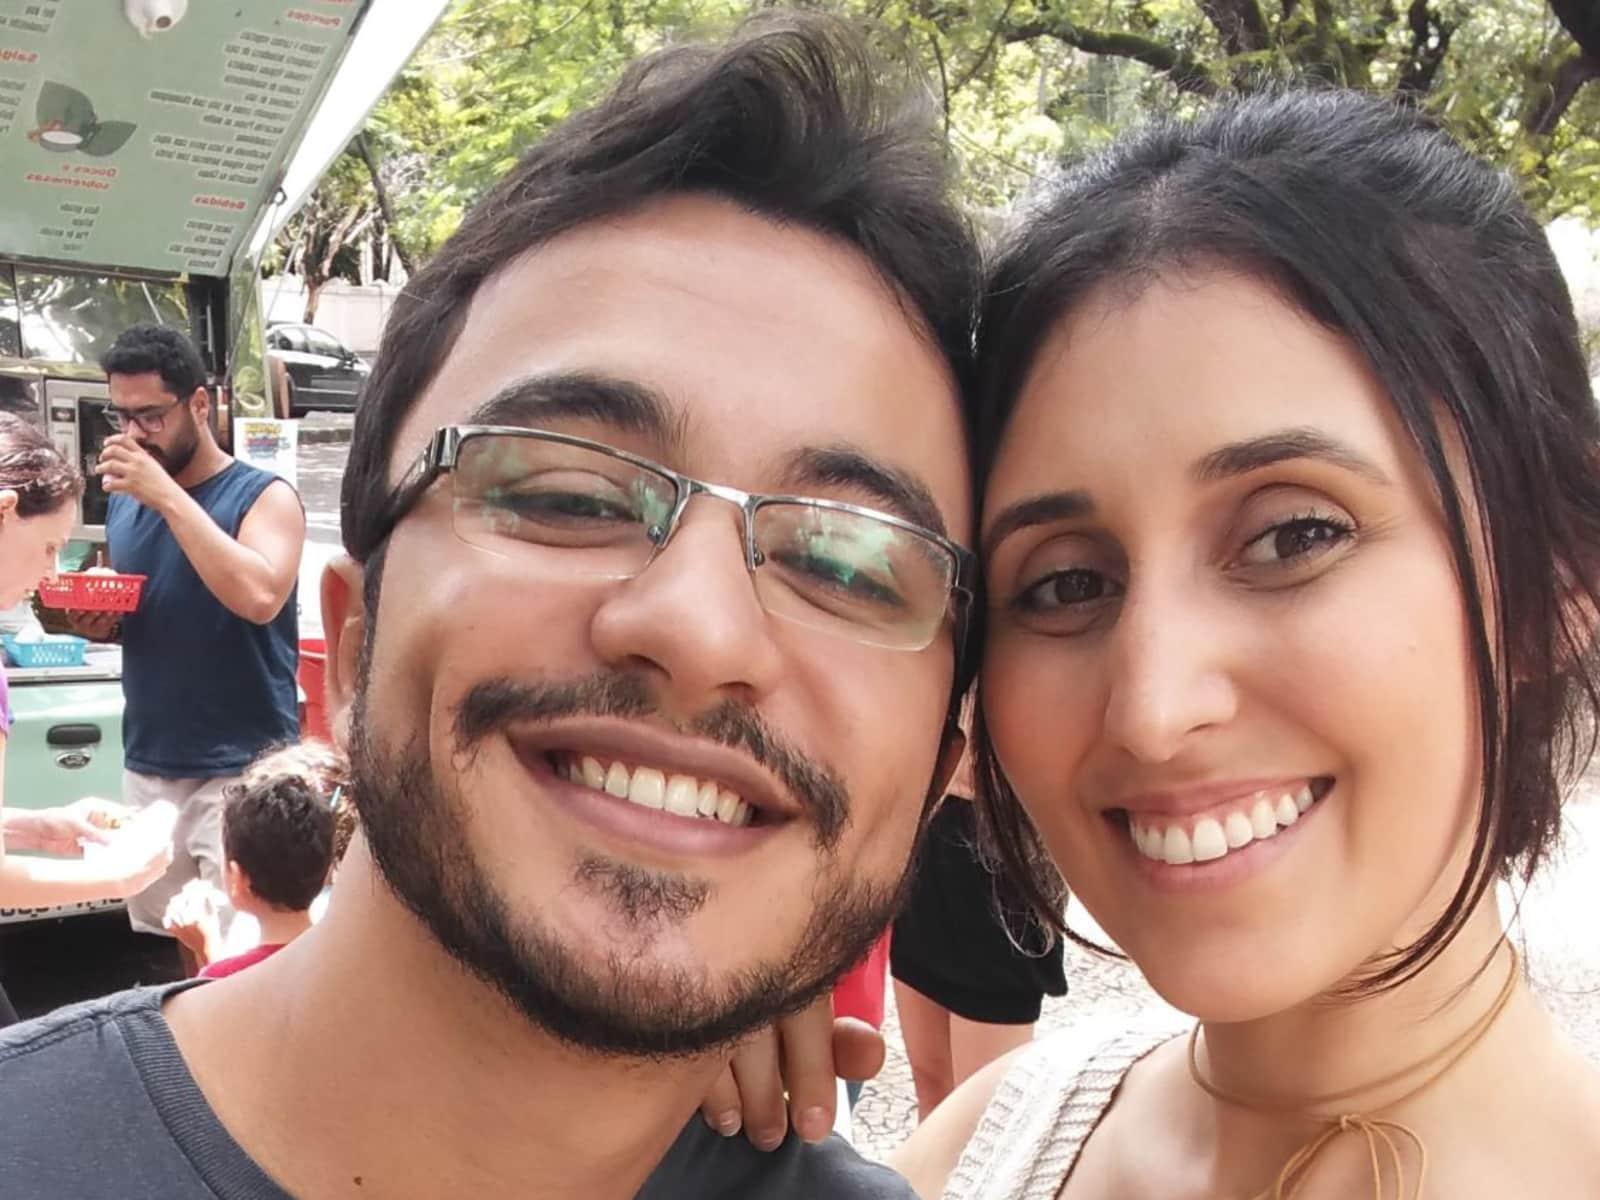 Jean & Isabela from Belo Horizonte, Brazil